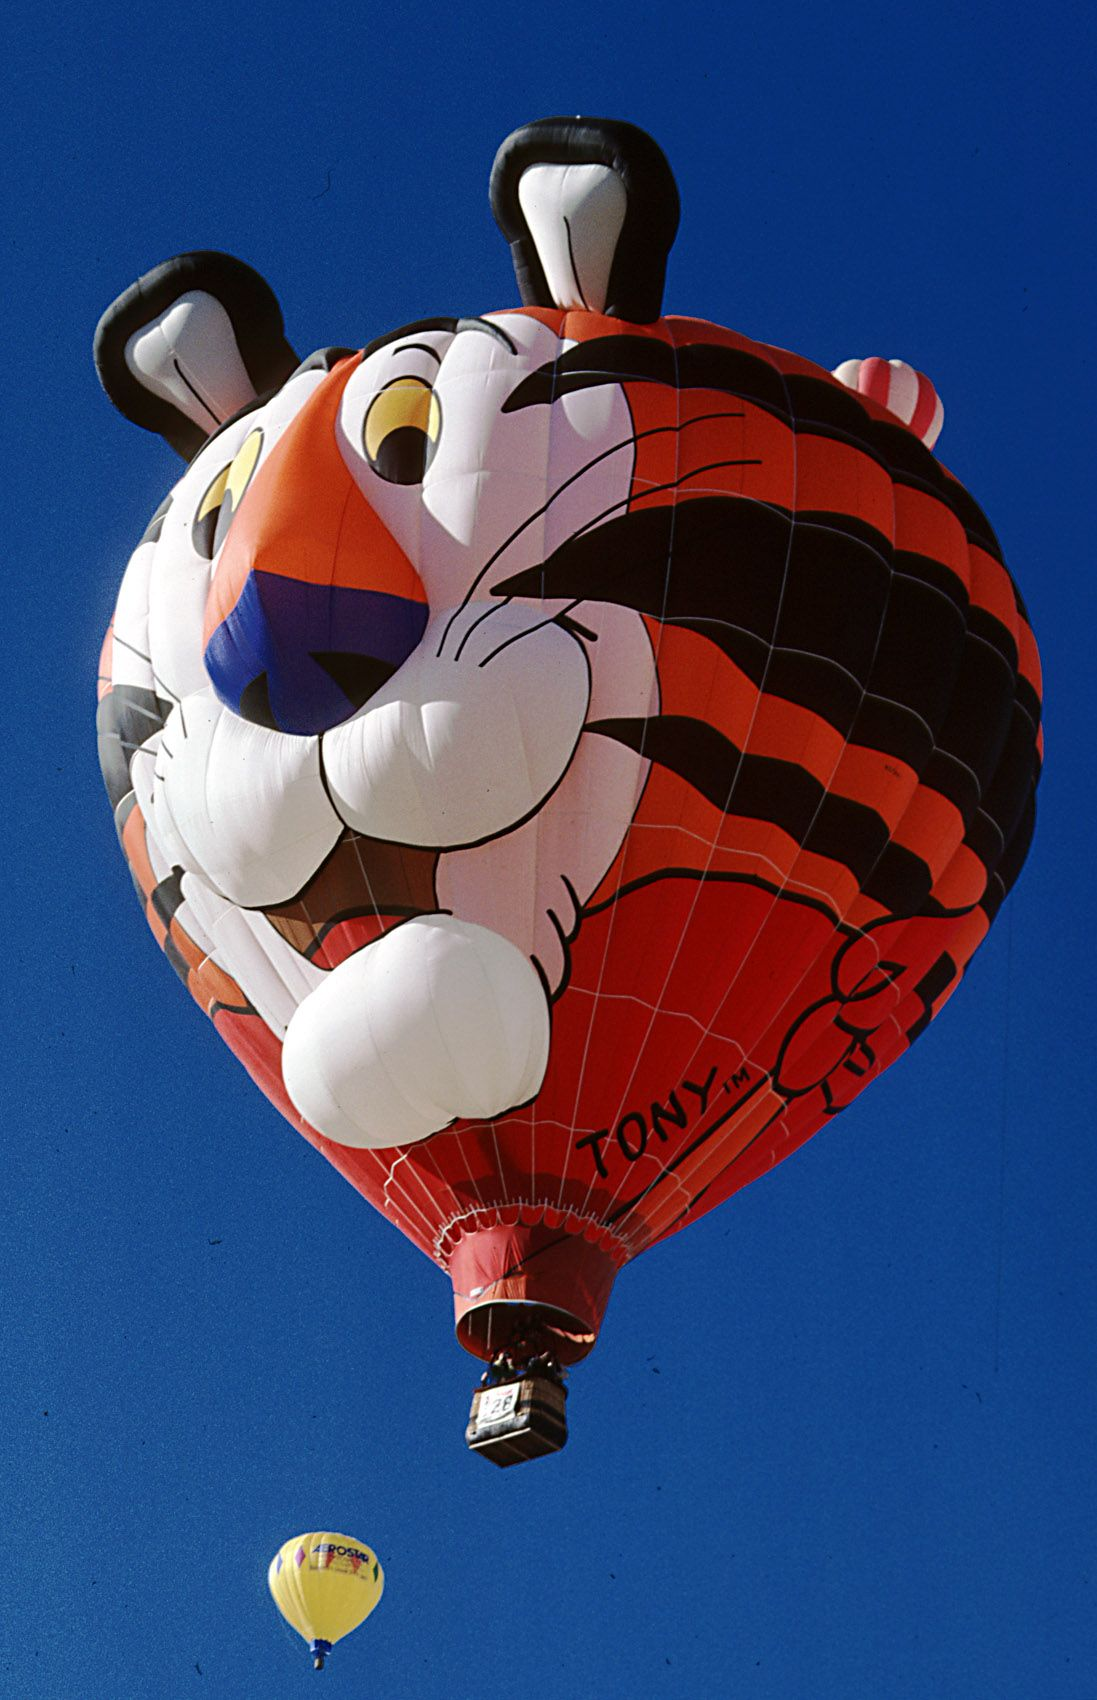 Tony The Tiger Hot Air Balloon Eye Of The Tiger Balloons